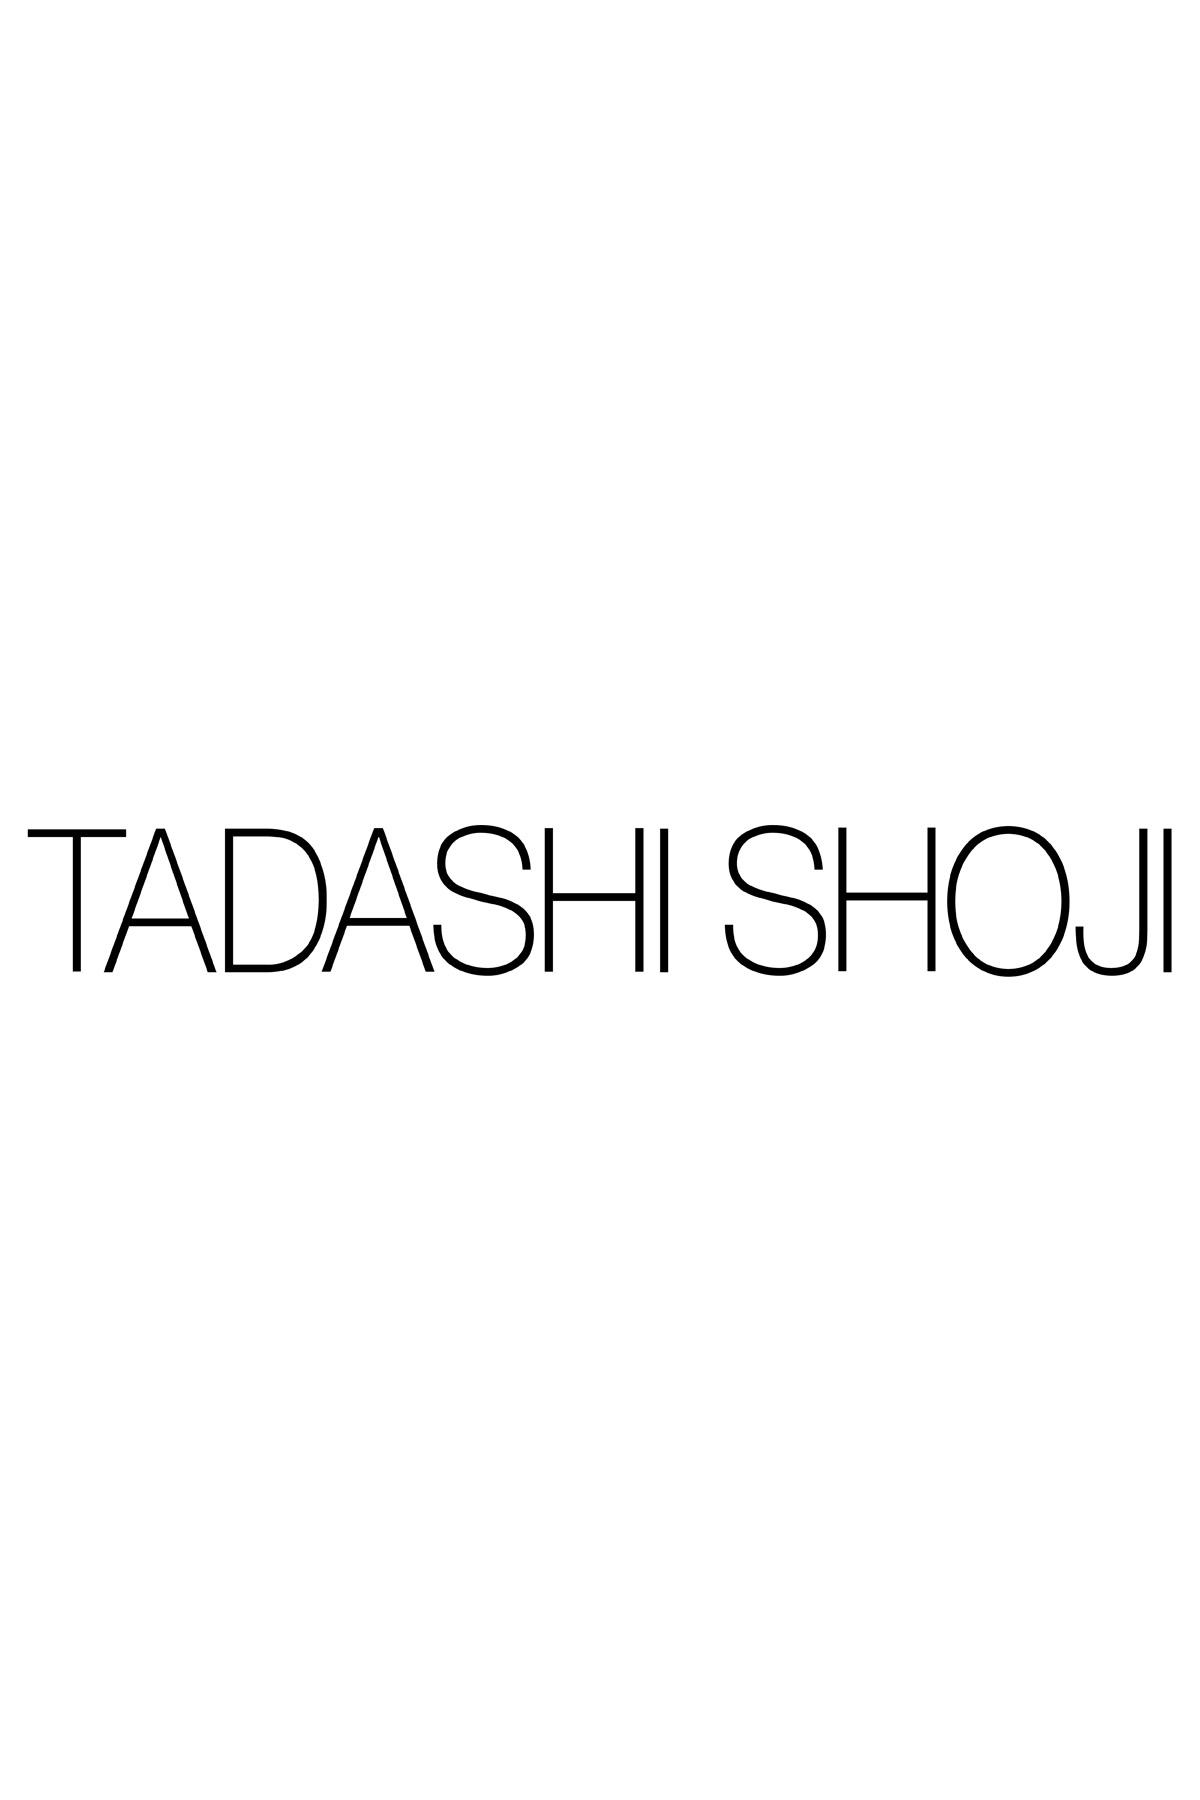 Tadashi Shoji - Chiarita Floral Print Dress